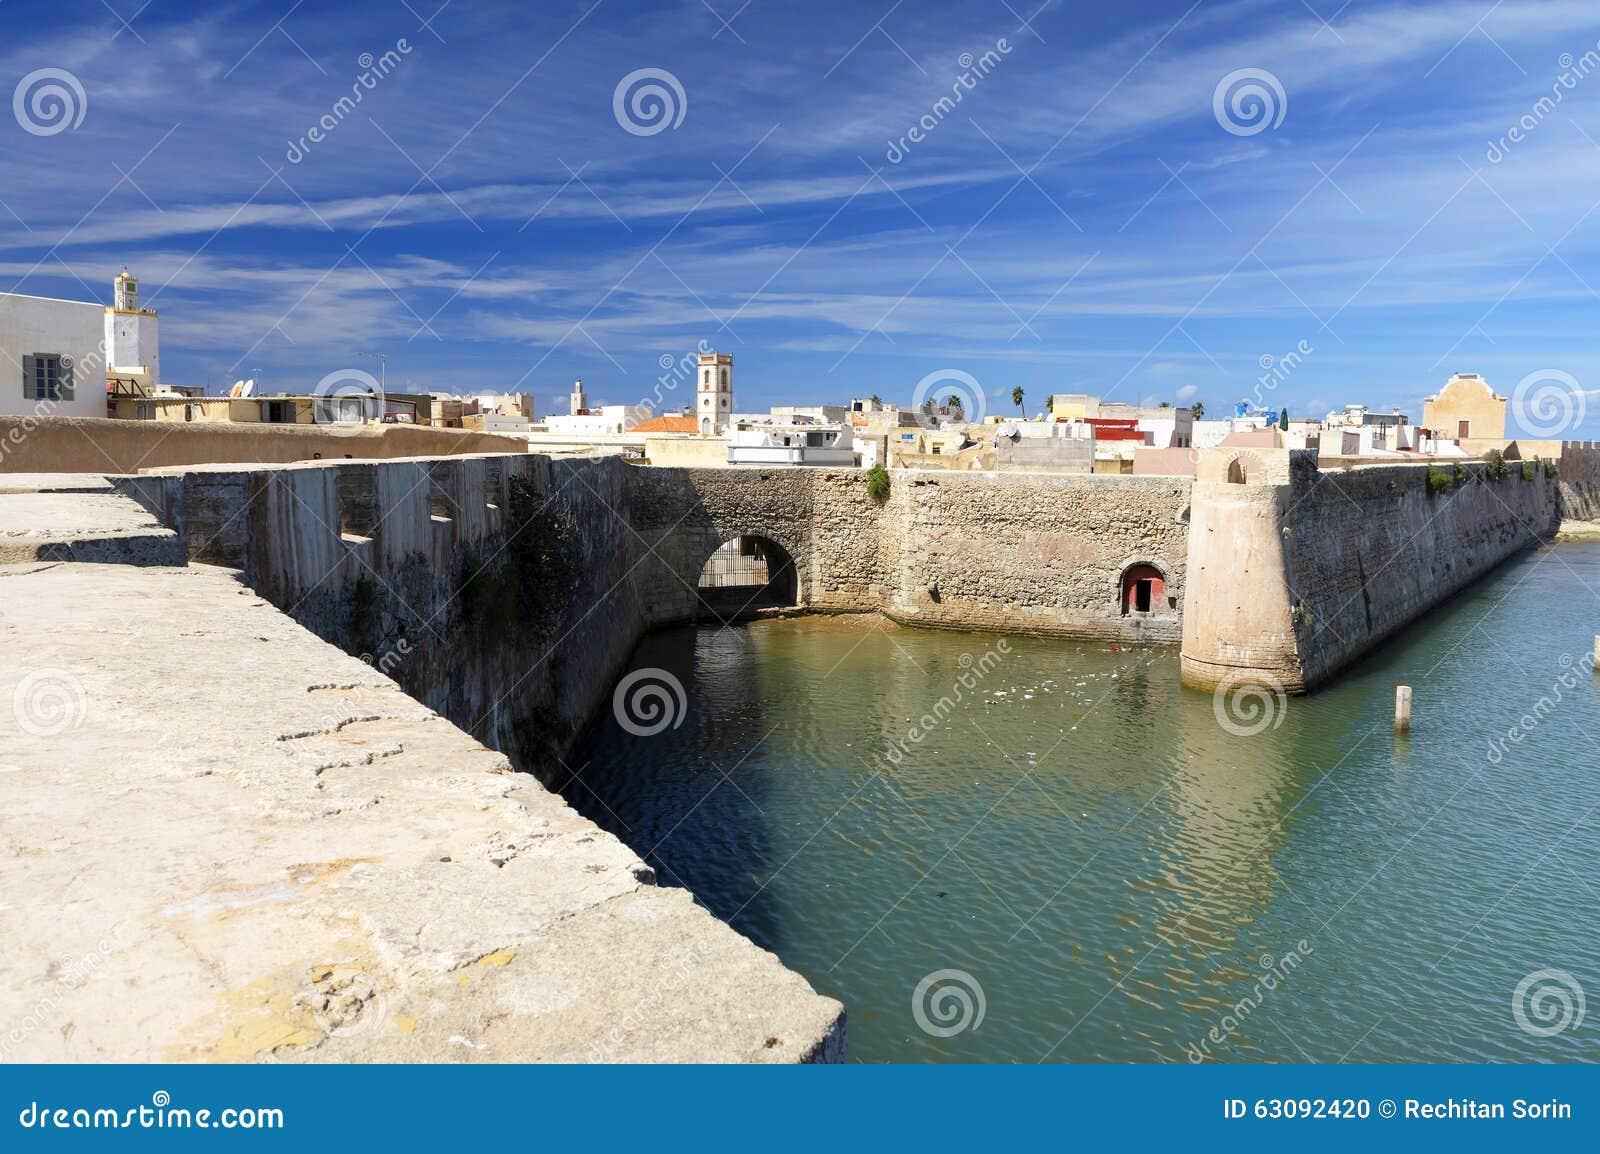 Download Détail Architectural De Mazagan, EL Jadida, Maroc Photo stock - Image du afrique, islam: 63092420